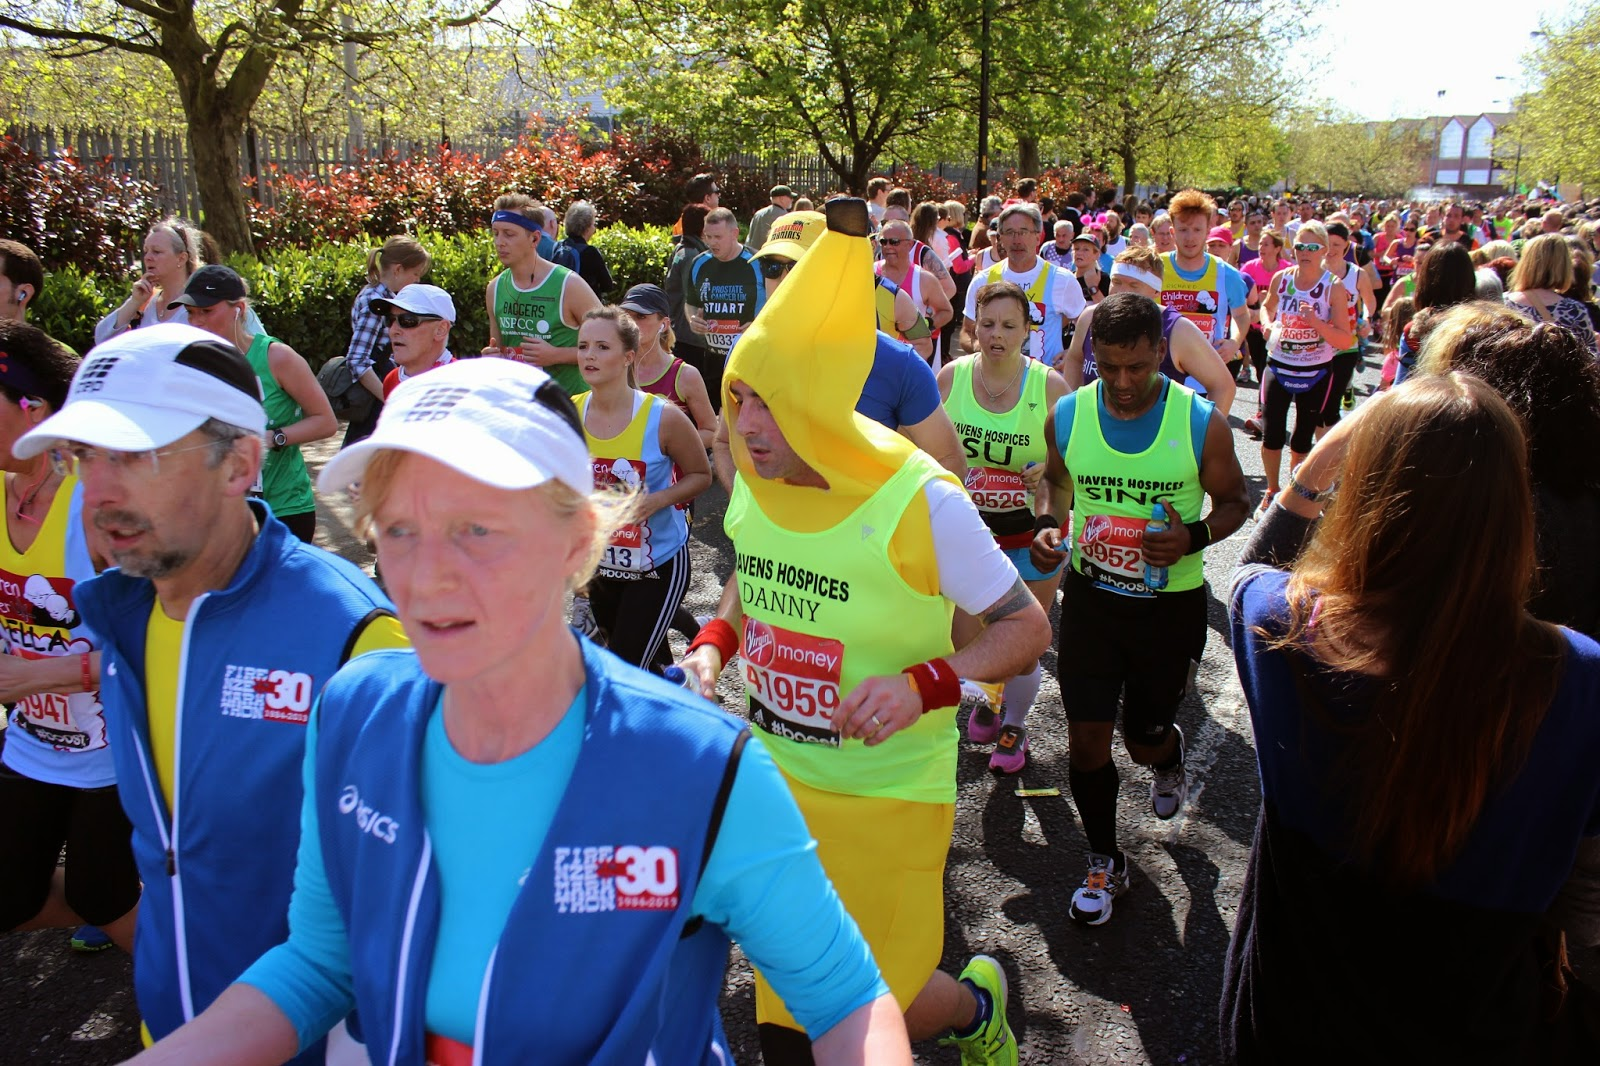 London Marathon 2014, That Guy Lukey, Fitness, Marathon, London, England, Virgin London Marathon 2014, blog, racing, running, sport, Marathon Running, Spectators, Marathon spectators